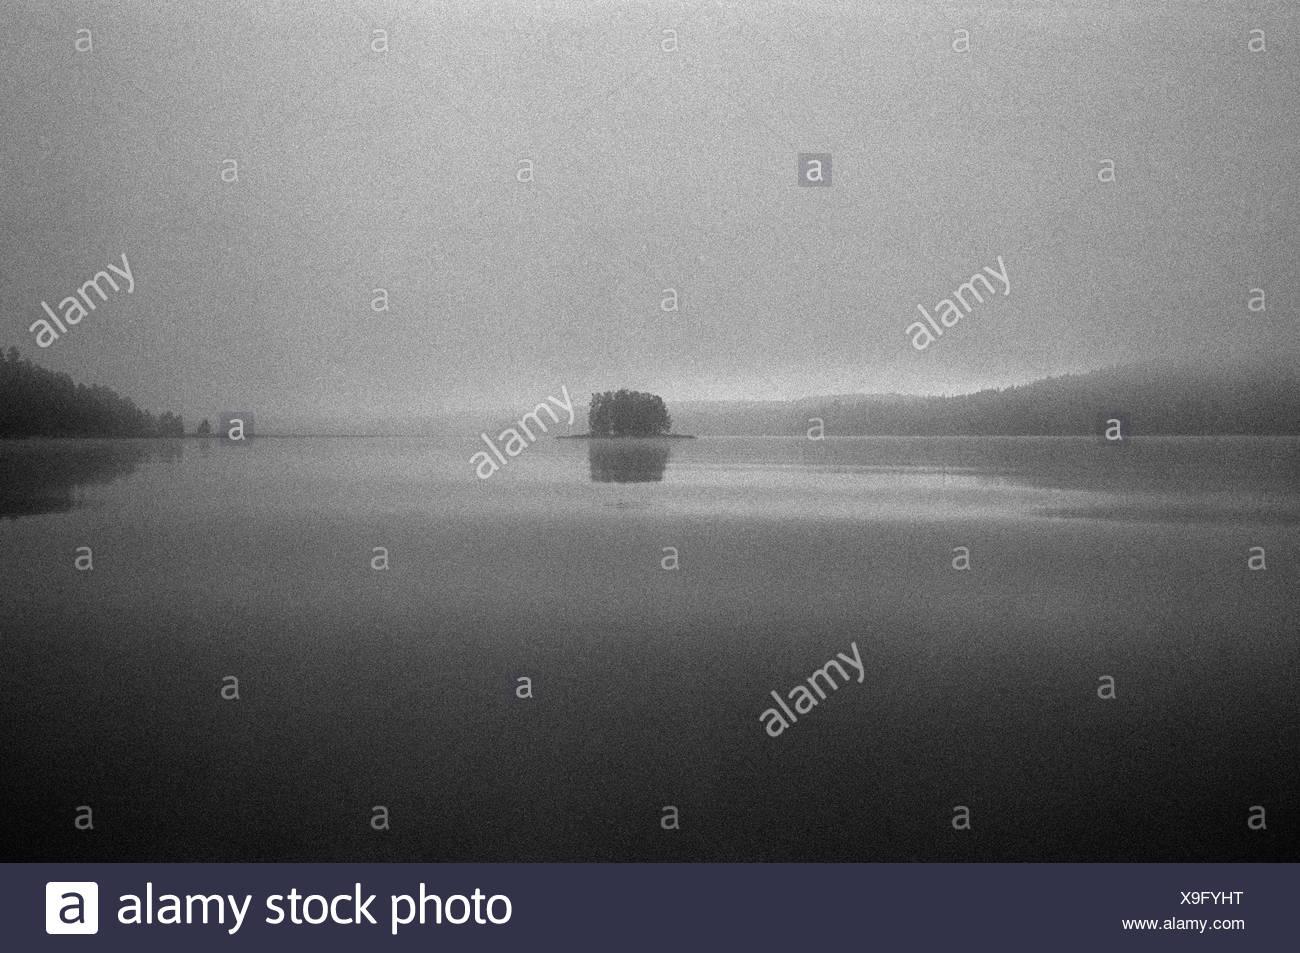 A small island, Dalarna, Sweden. - Stock Image